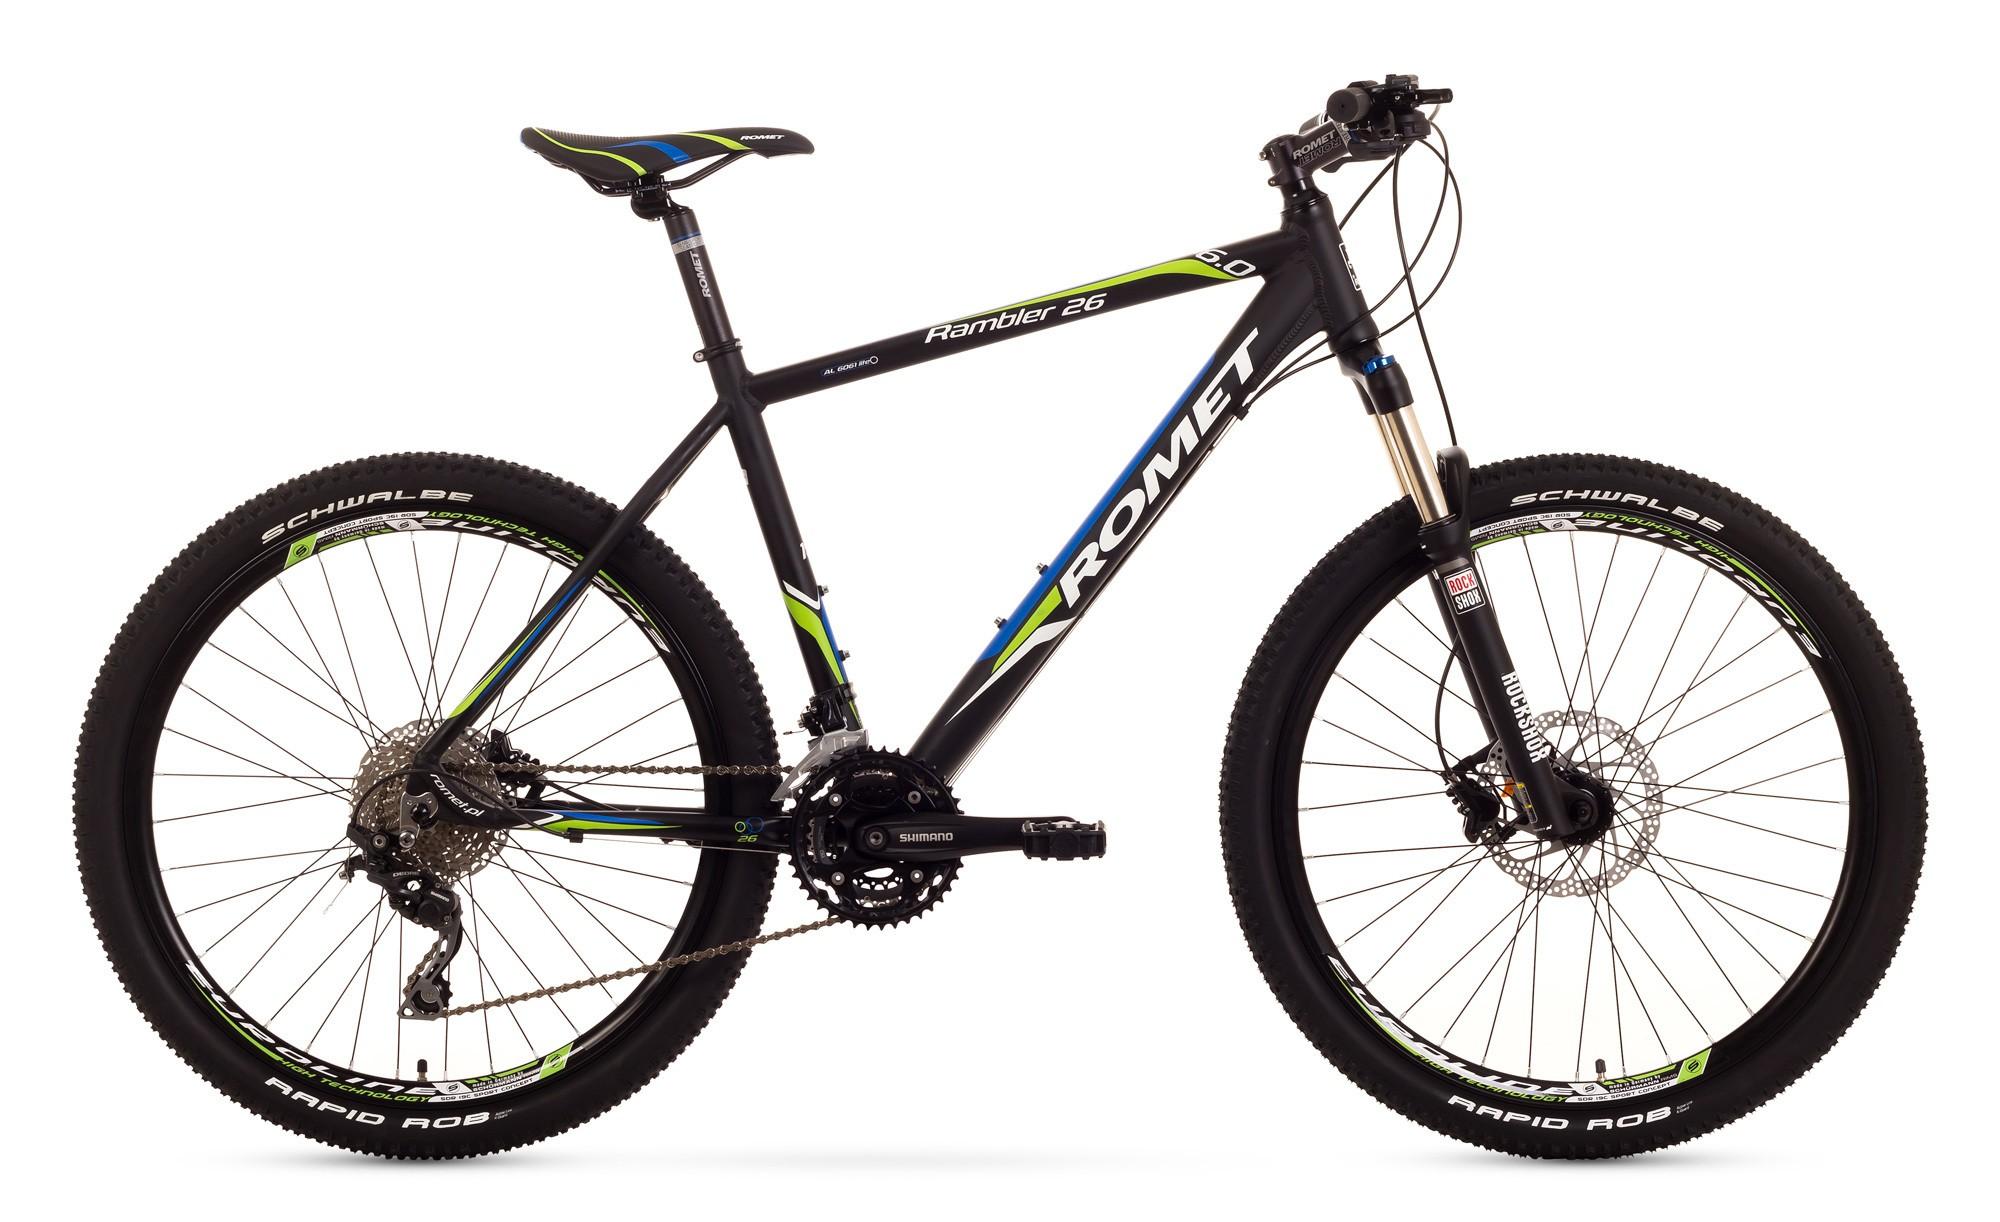 Bicicleta MTB Romet Rambler 26 6.0 - negru-albastru-verde